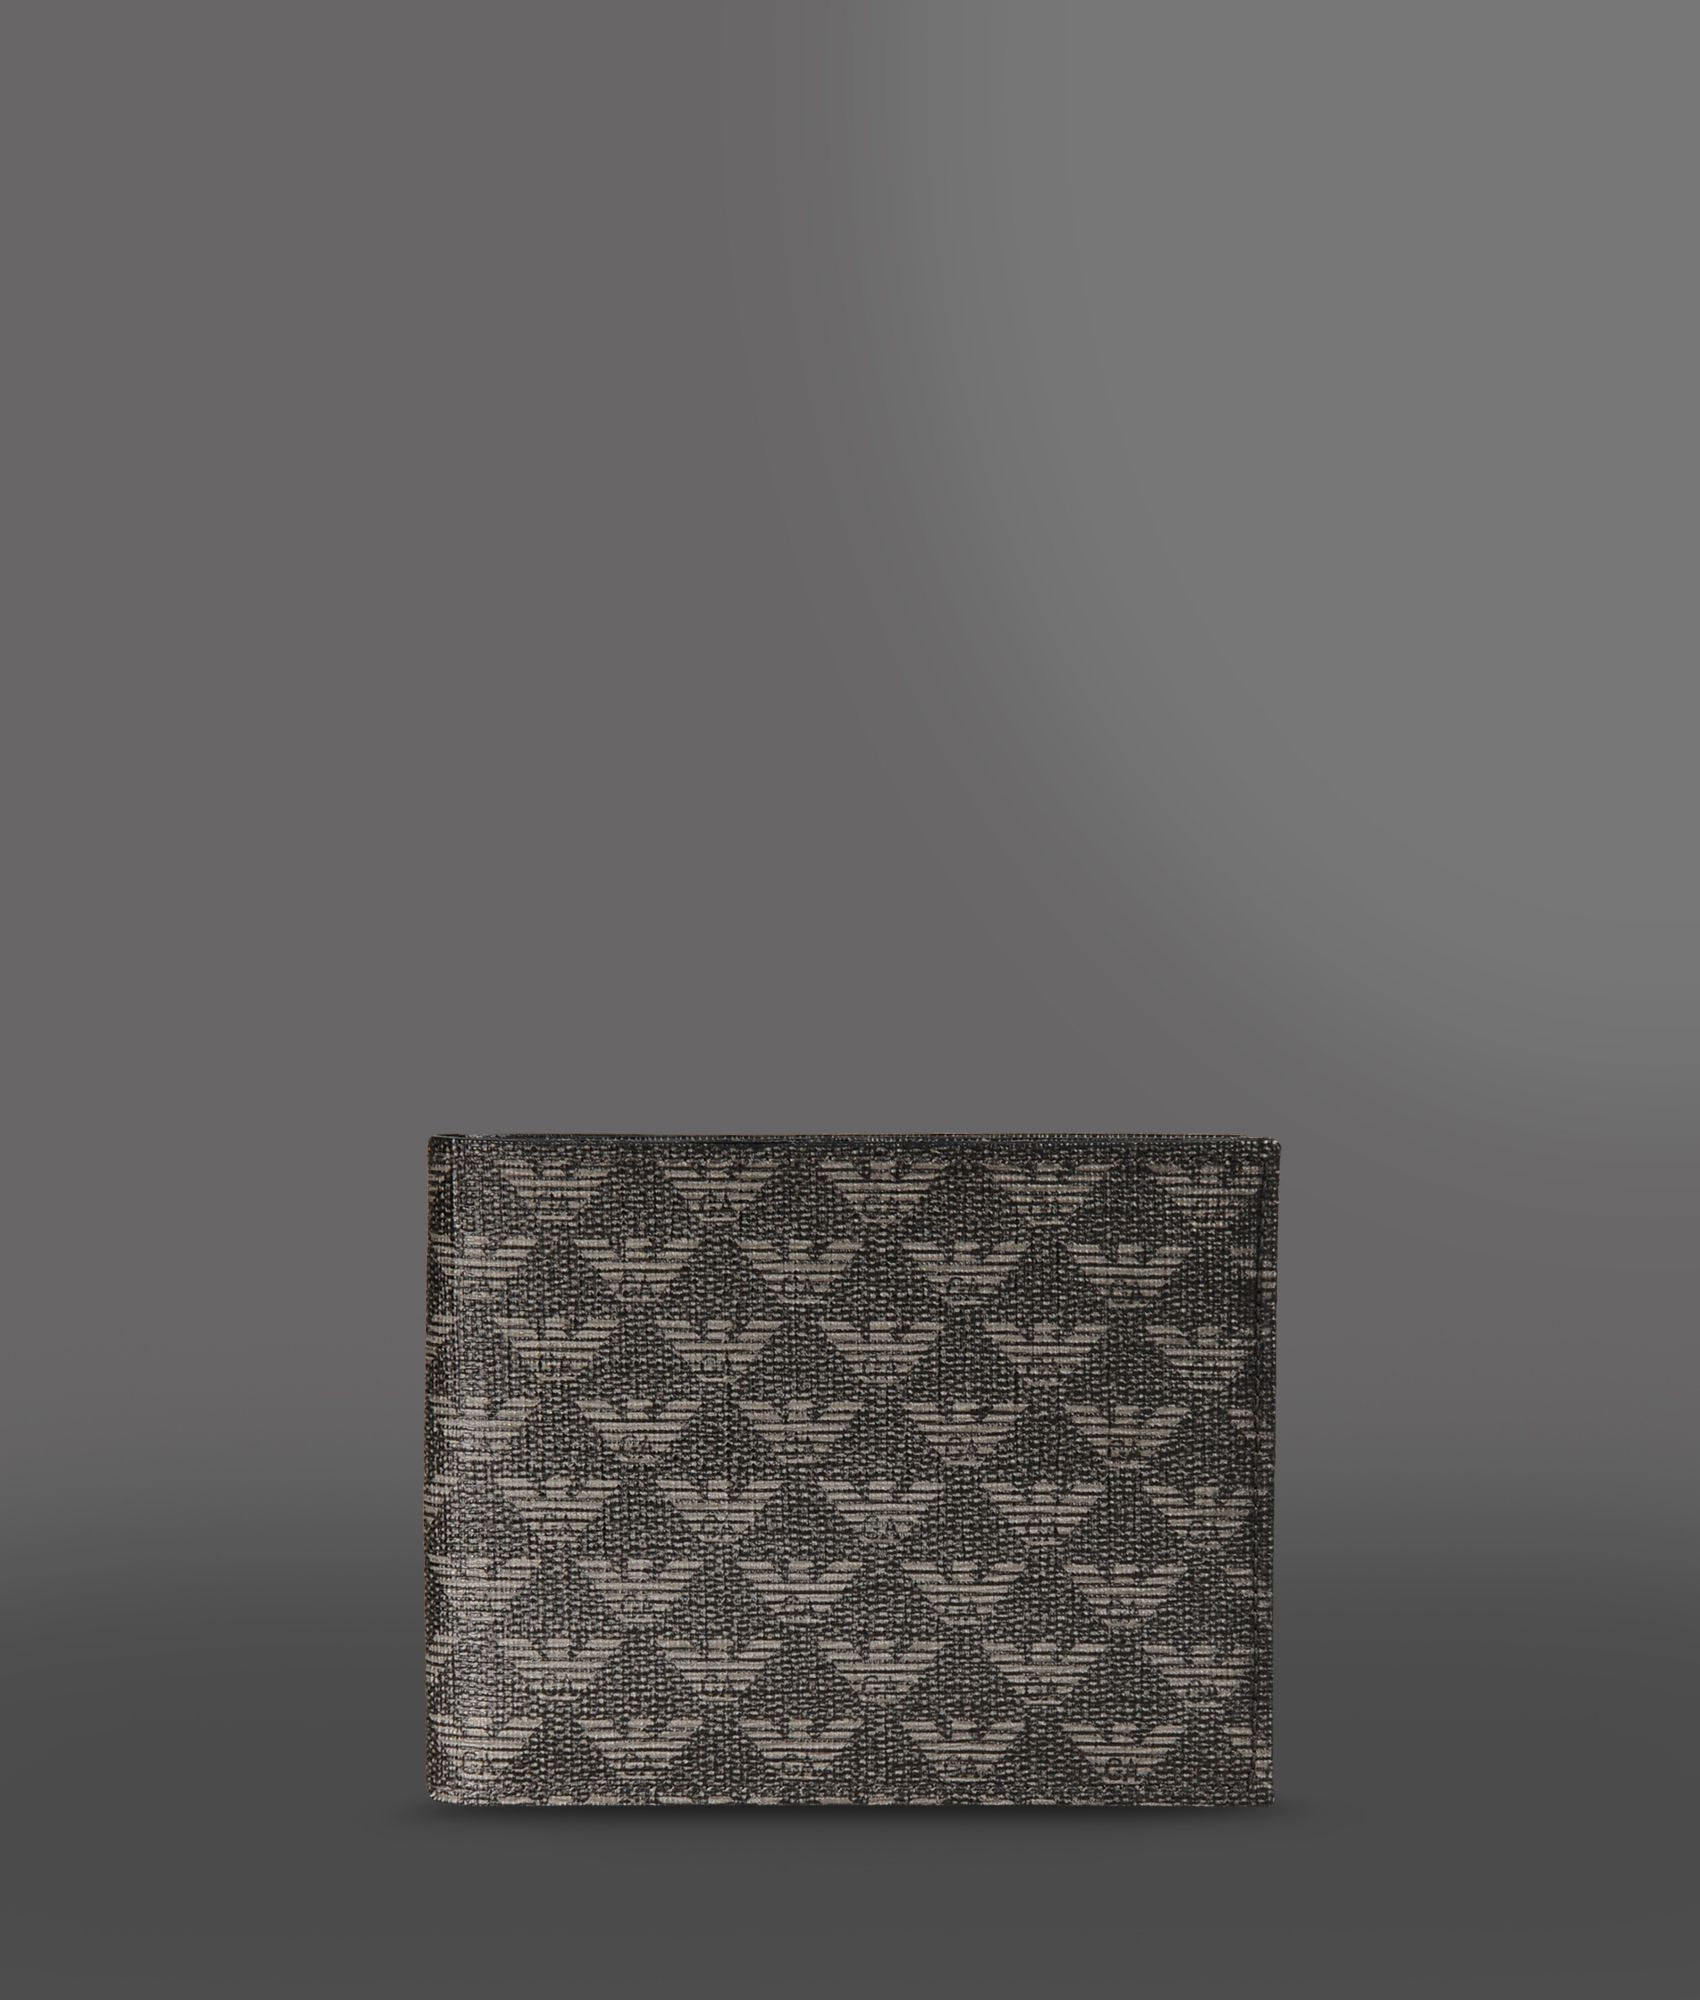 91a2fbd442 Lyst - Emporio Armani Wallet in Gray for Men